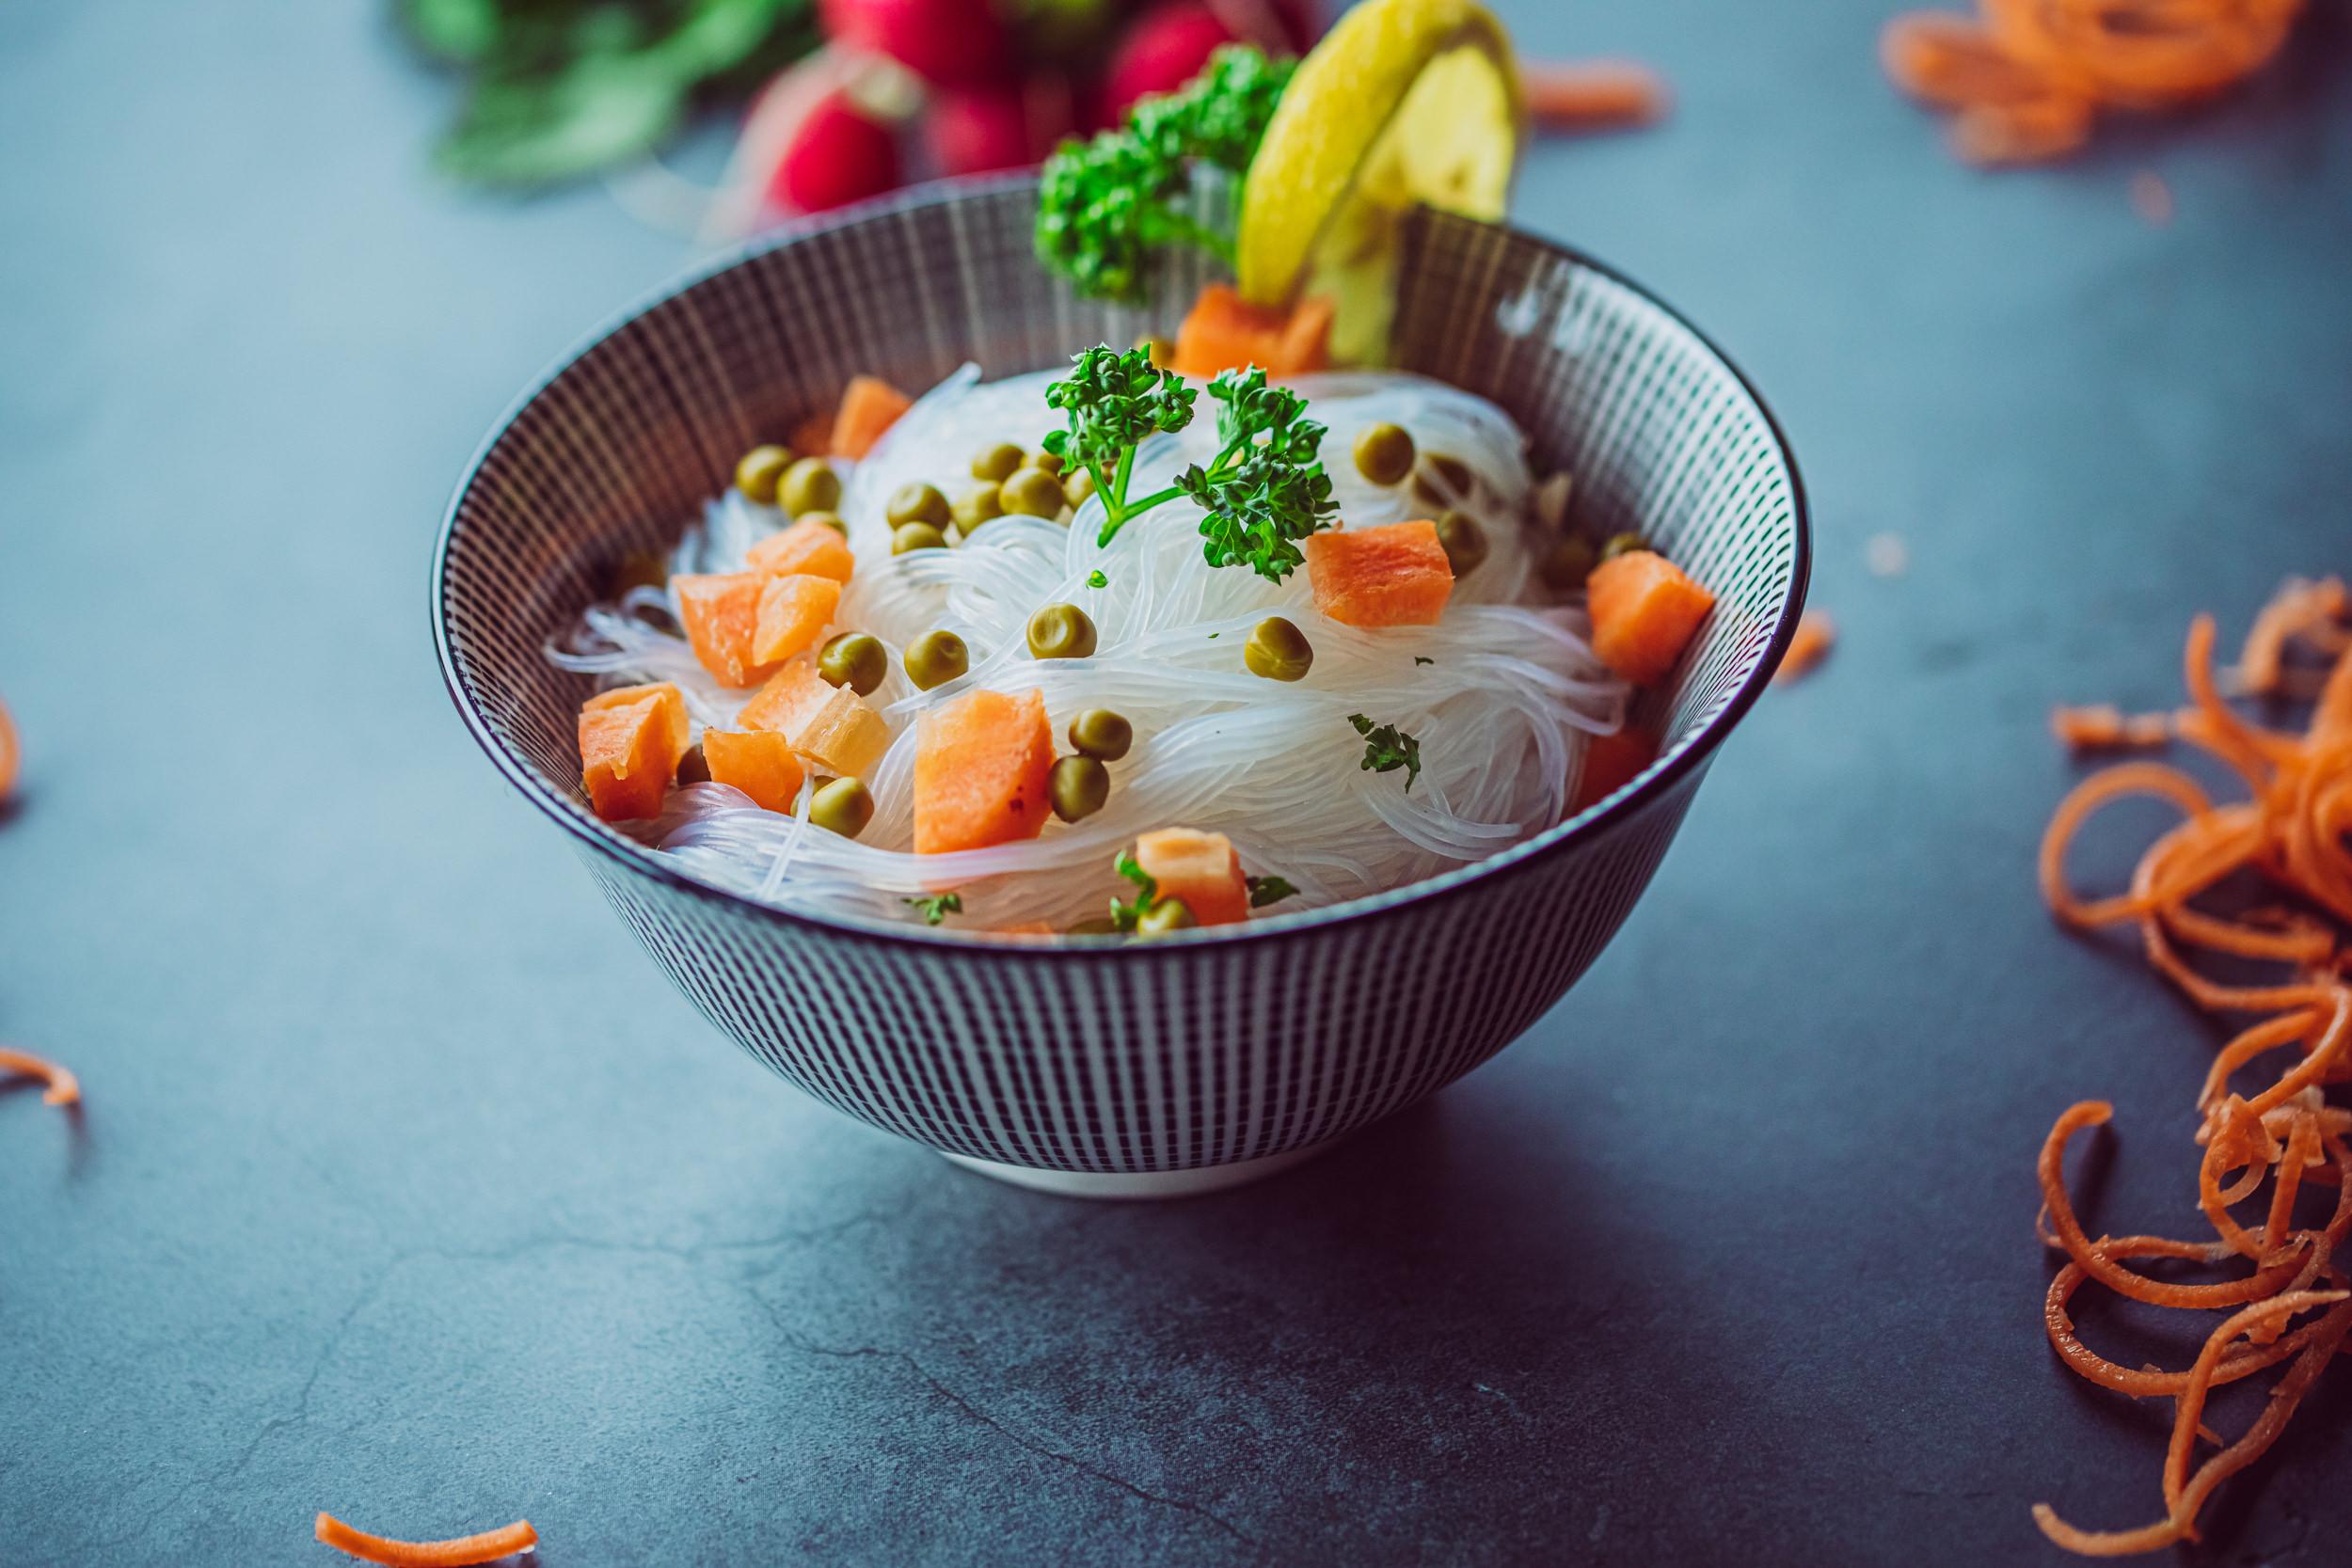 FOOD STUDIO PATRICKSCHMETZER ESSEN 8  Food